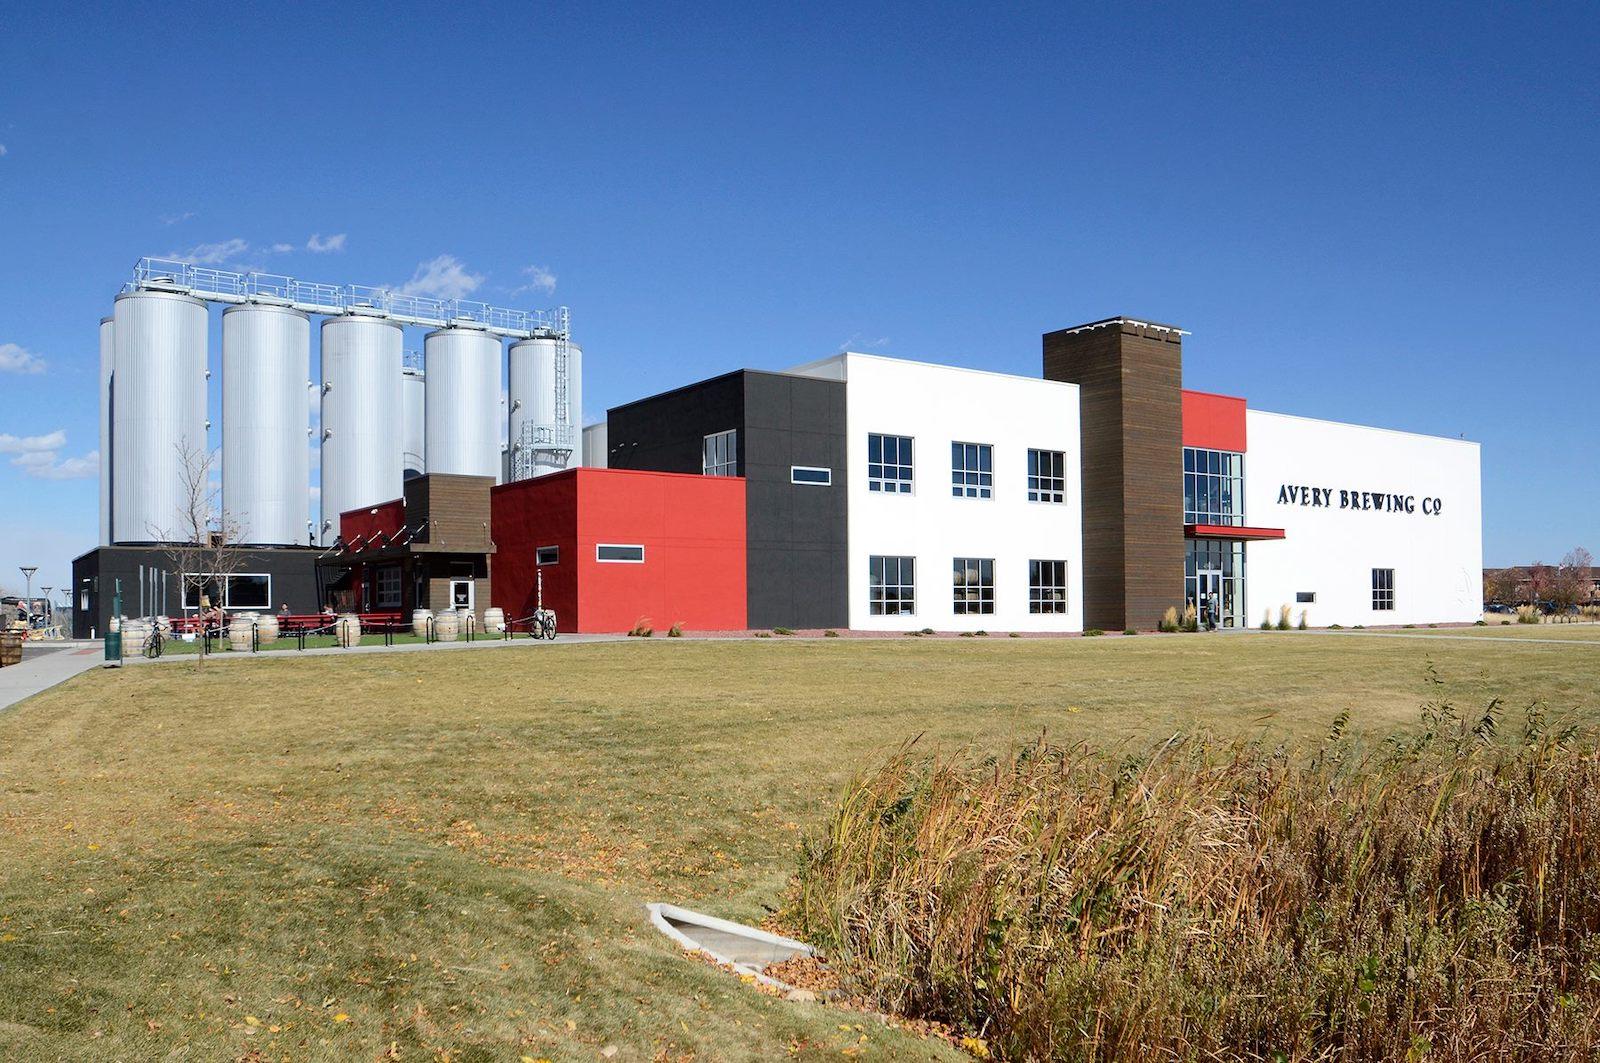 Perusahaan Pembuatan Bir Avery, Colorado